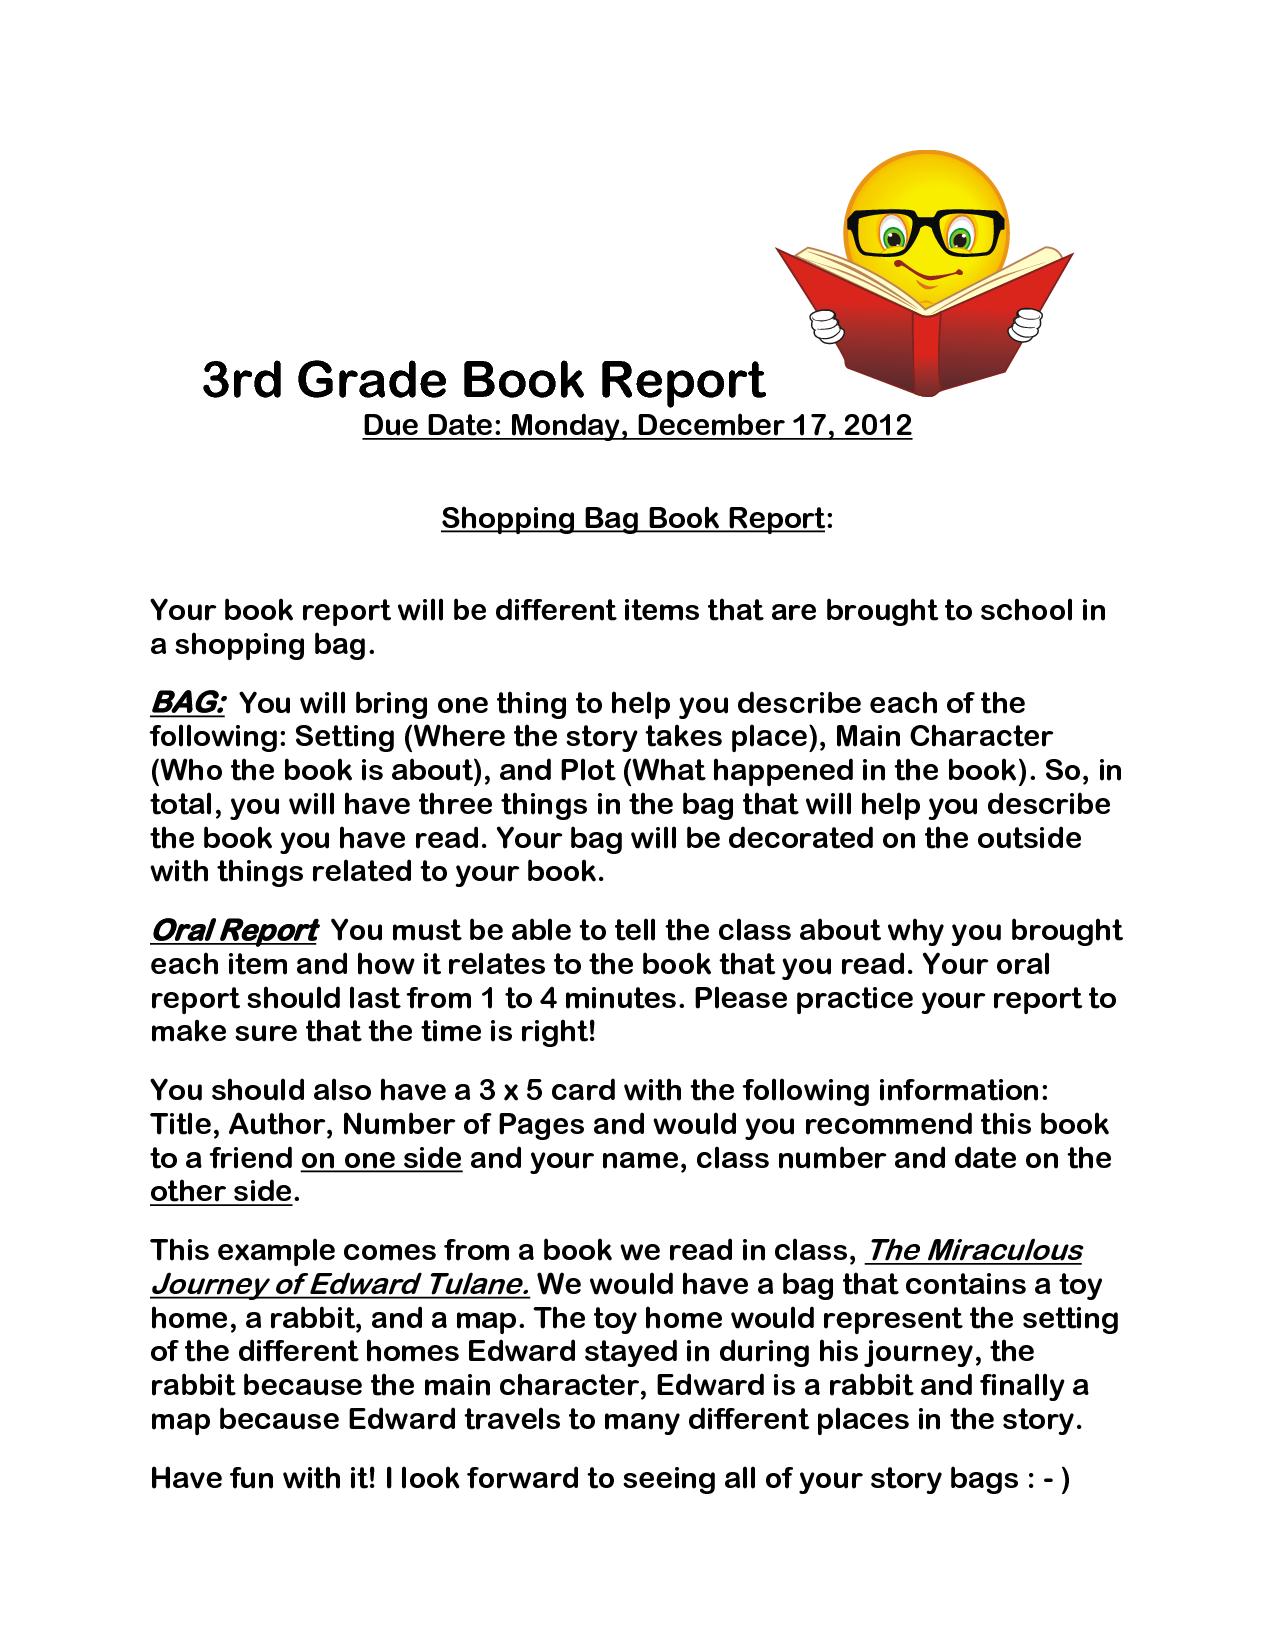 Free Book Report Template 3rd Grade